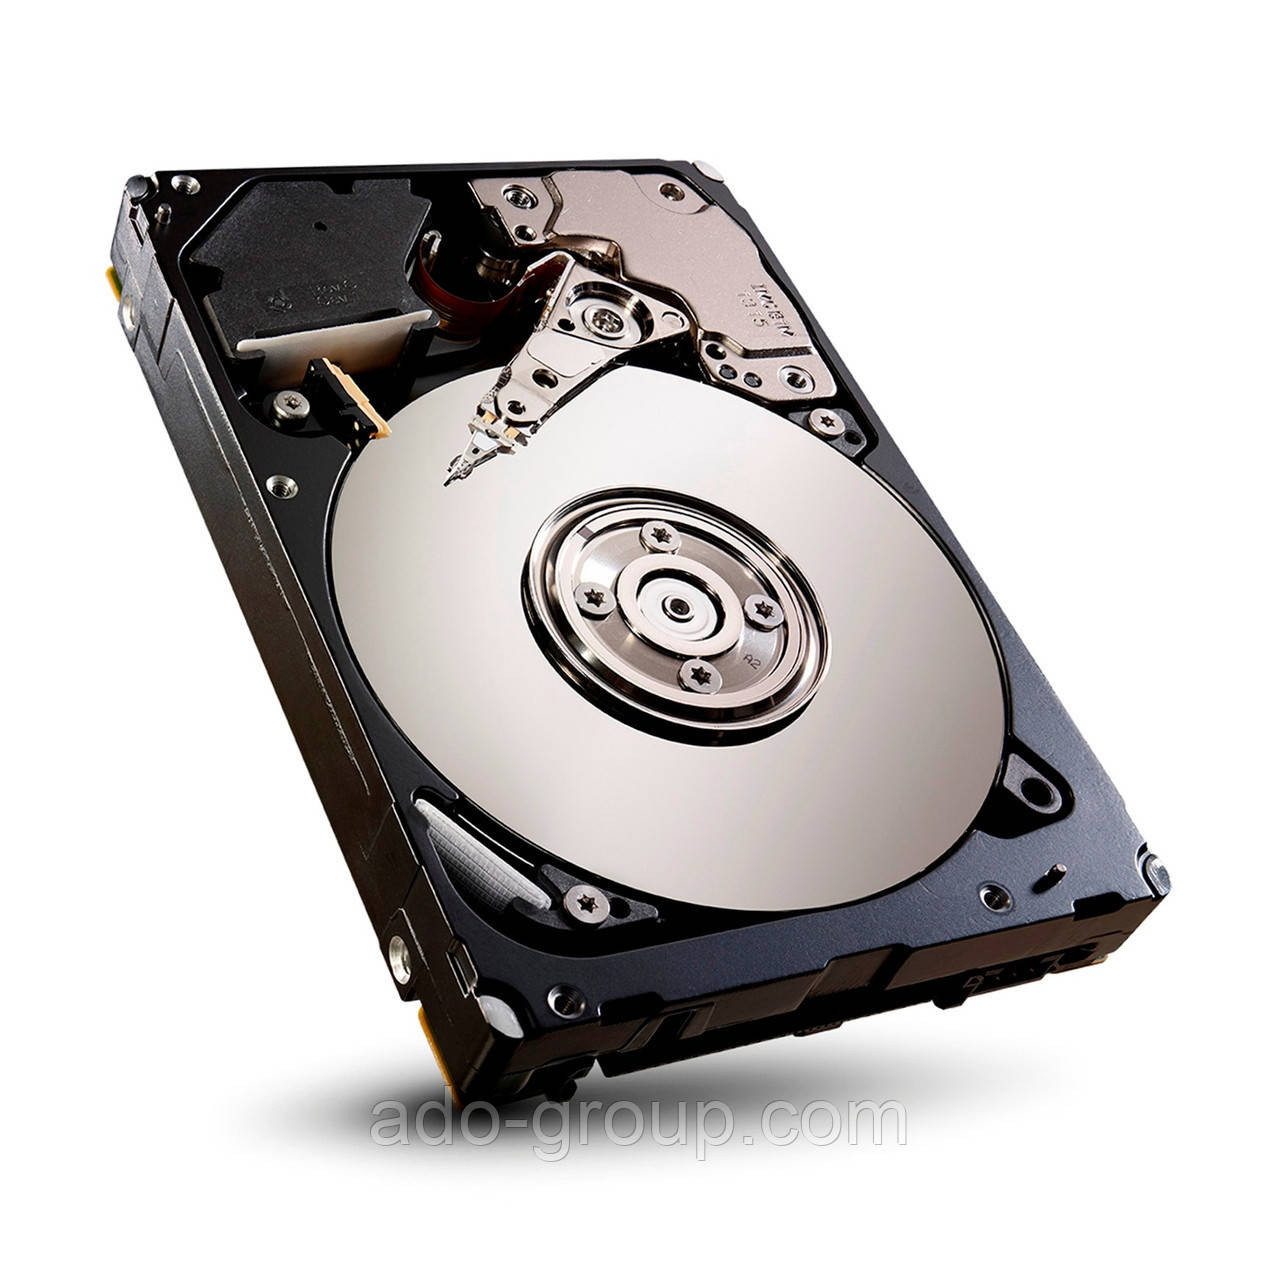 "NW342 Жесткий диск Dell 750GB SATA 7.2K  3.5"" +"